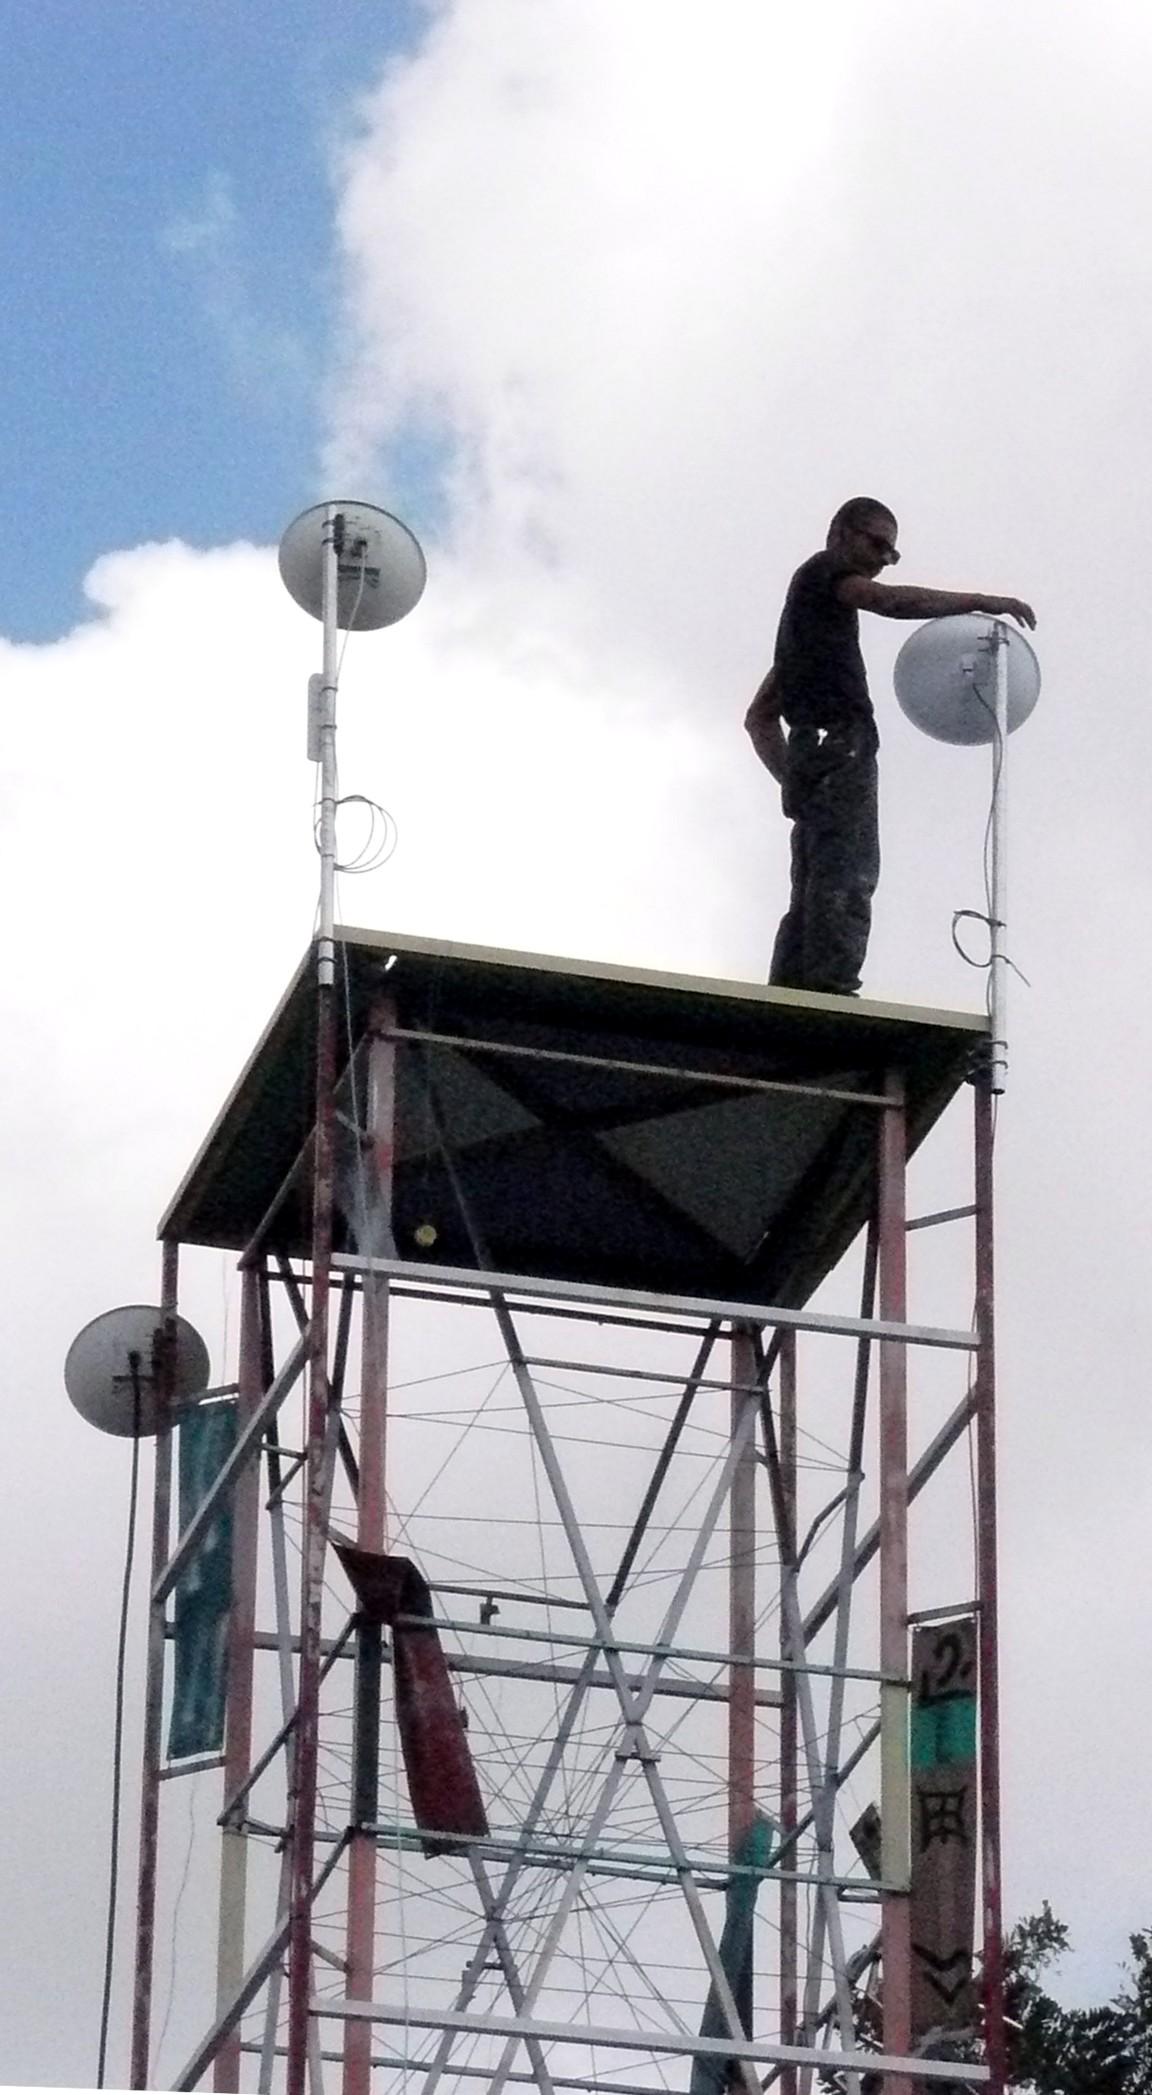 http://la.buvette.org/photos/ttnn/carlos-et-antenne.jpg